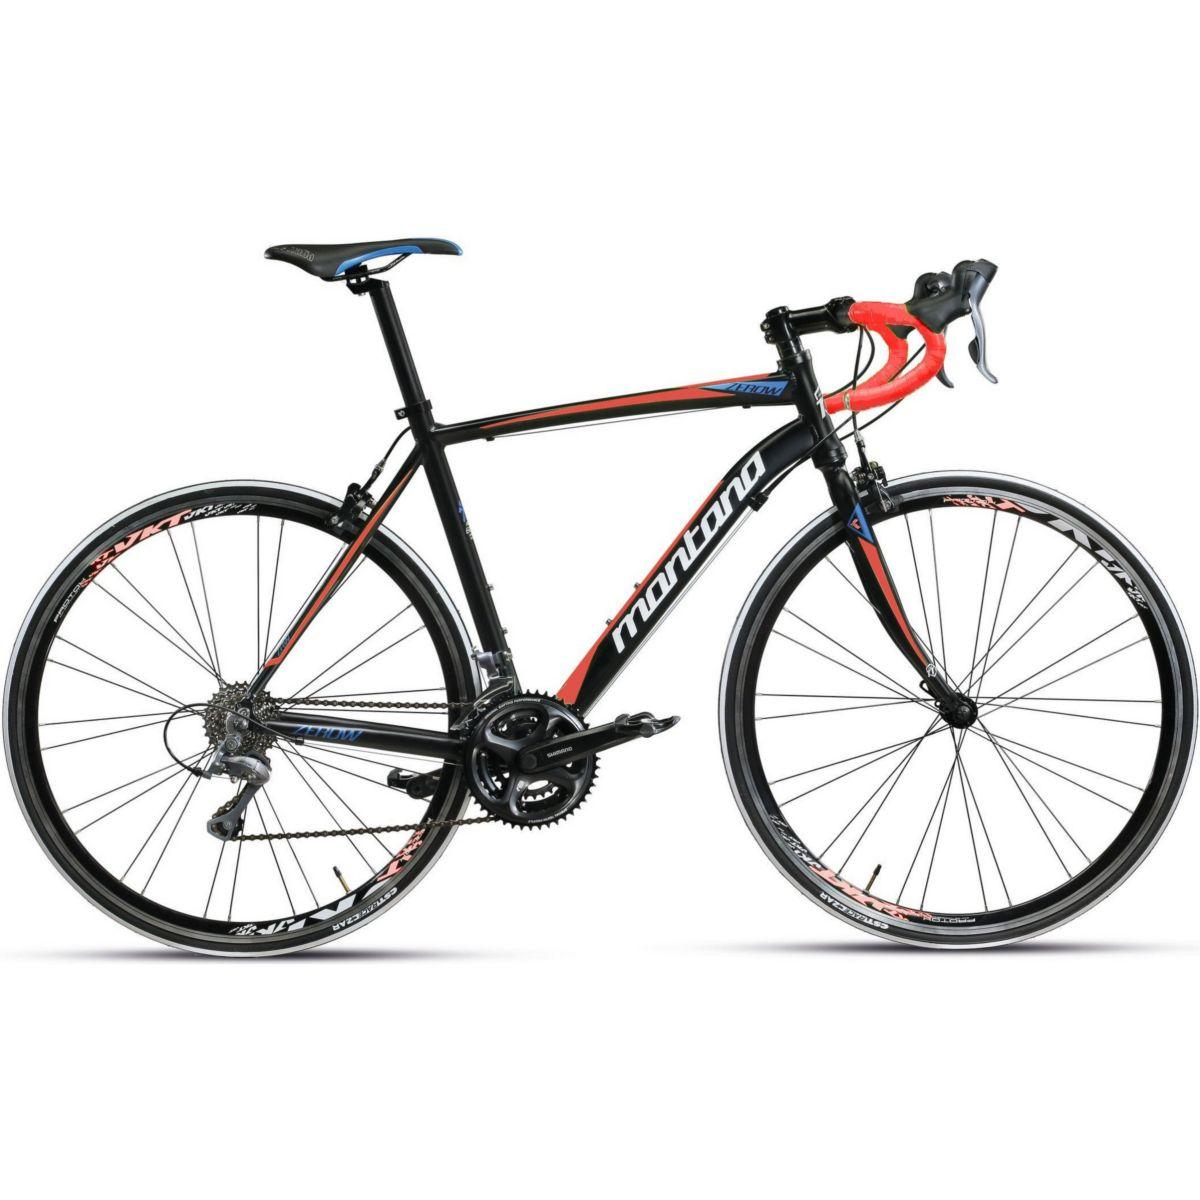 28 Zoll Rennrad 24 Gang Montana Zerow schwarz-rot, 48cm jetztbilligerkaufen